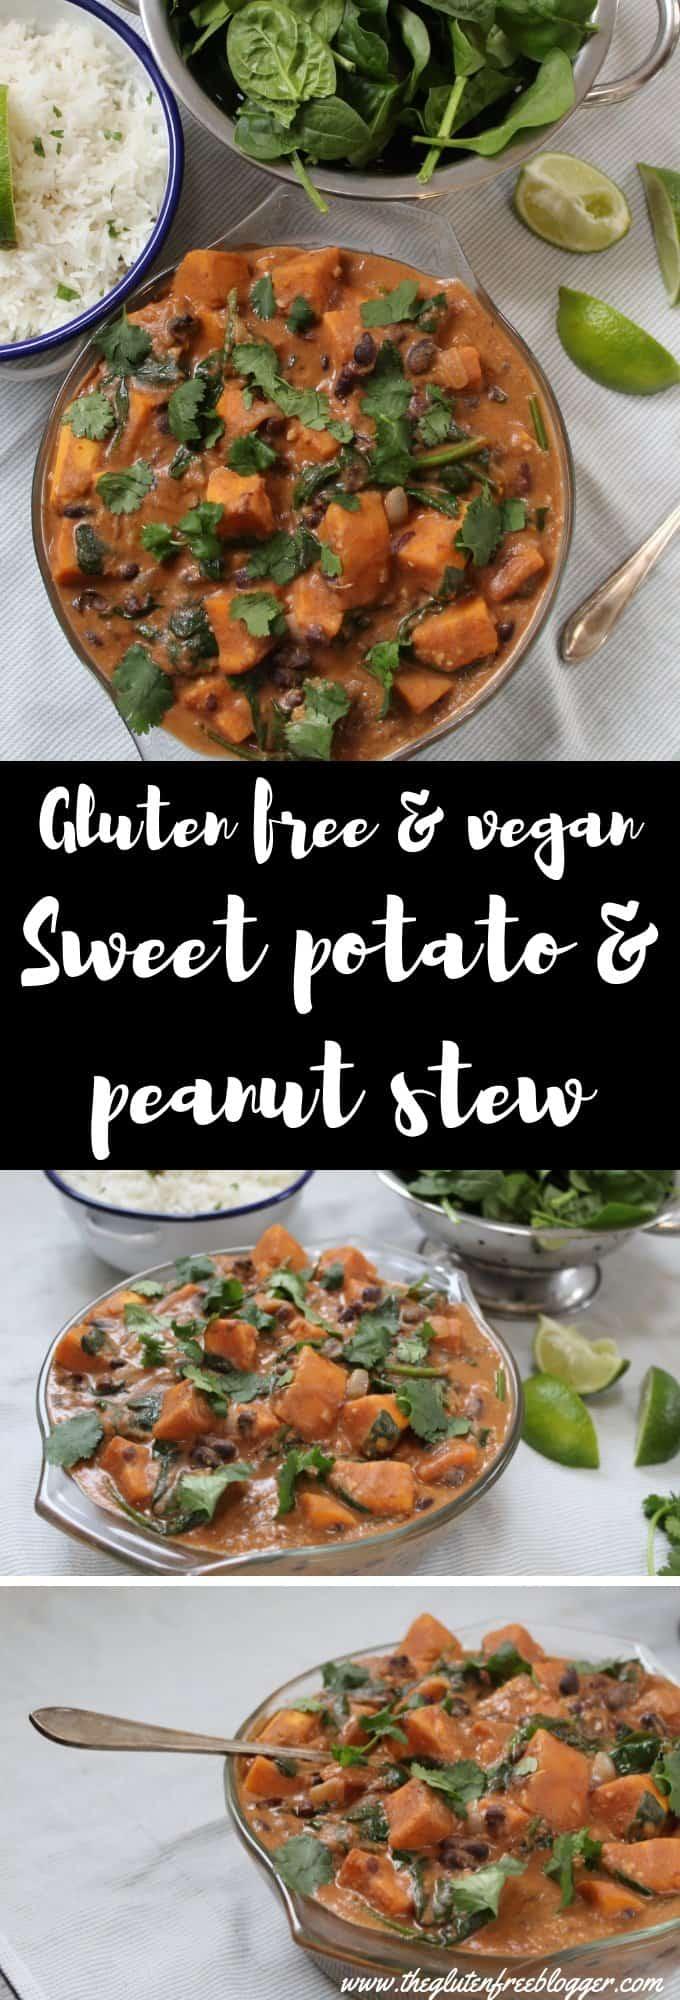 gluten free vegan recipe sweet potato black bean peanut dairy free vegetarian dinner inspiration easy recipe